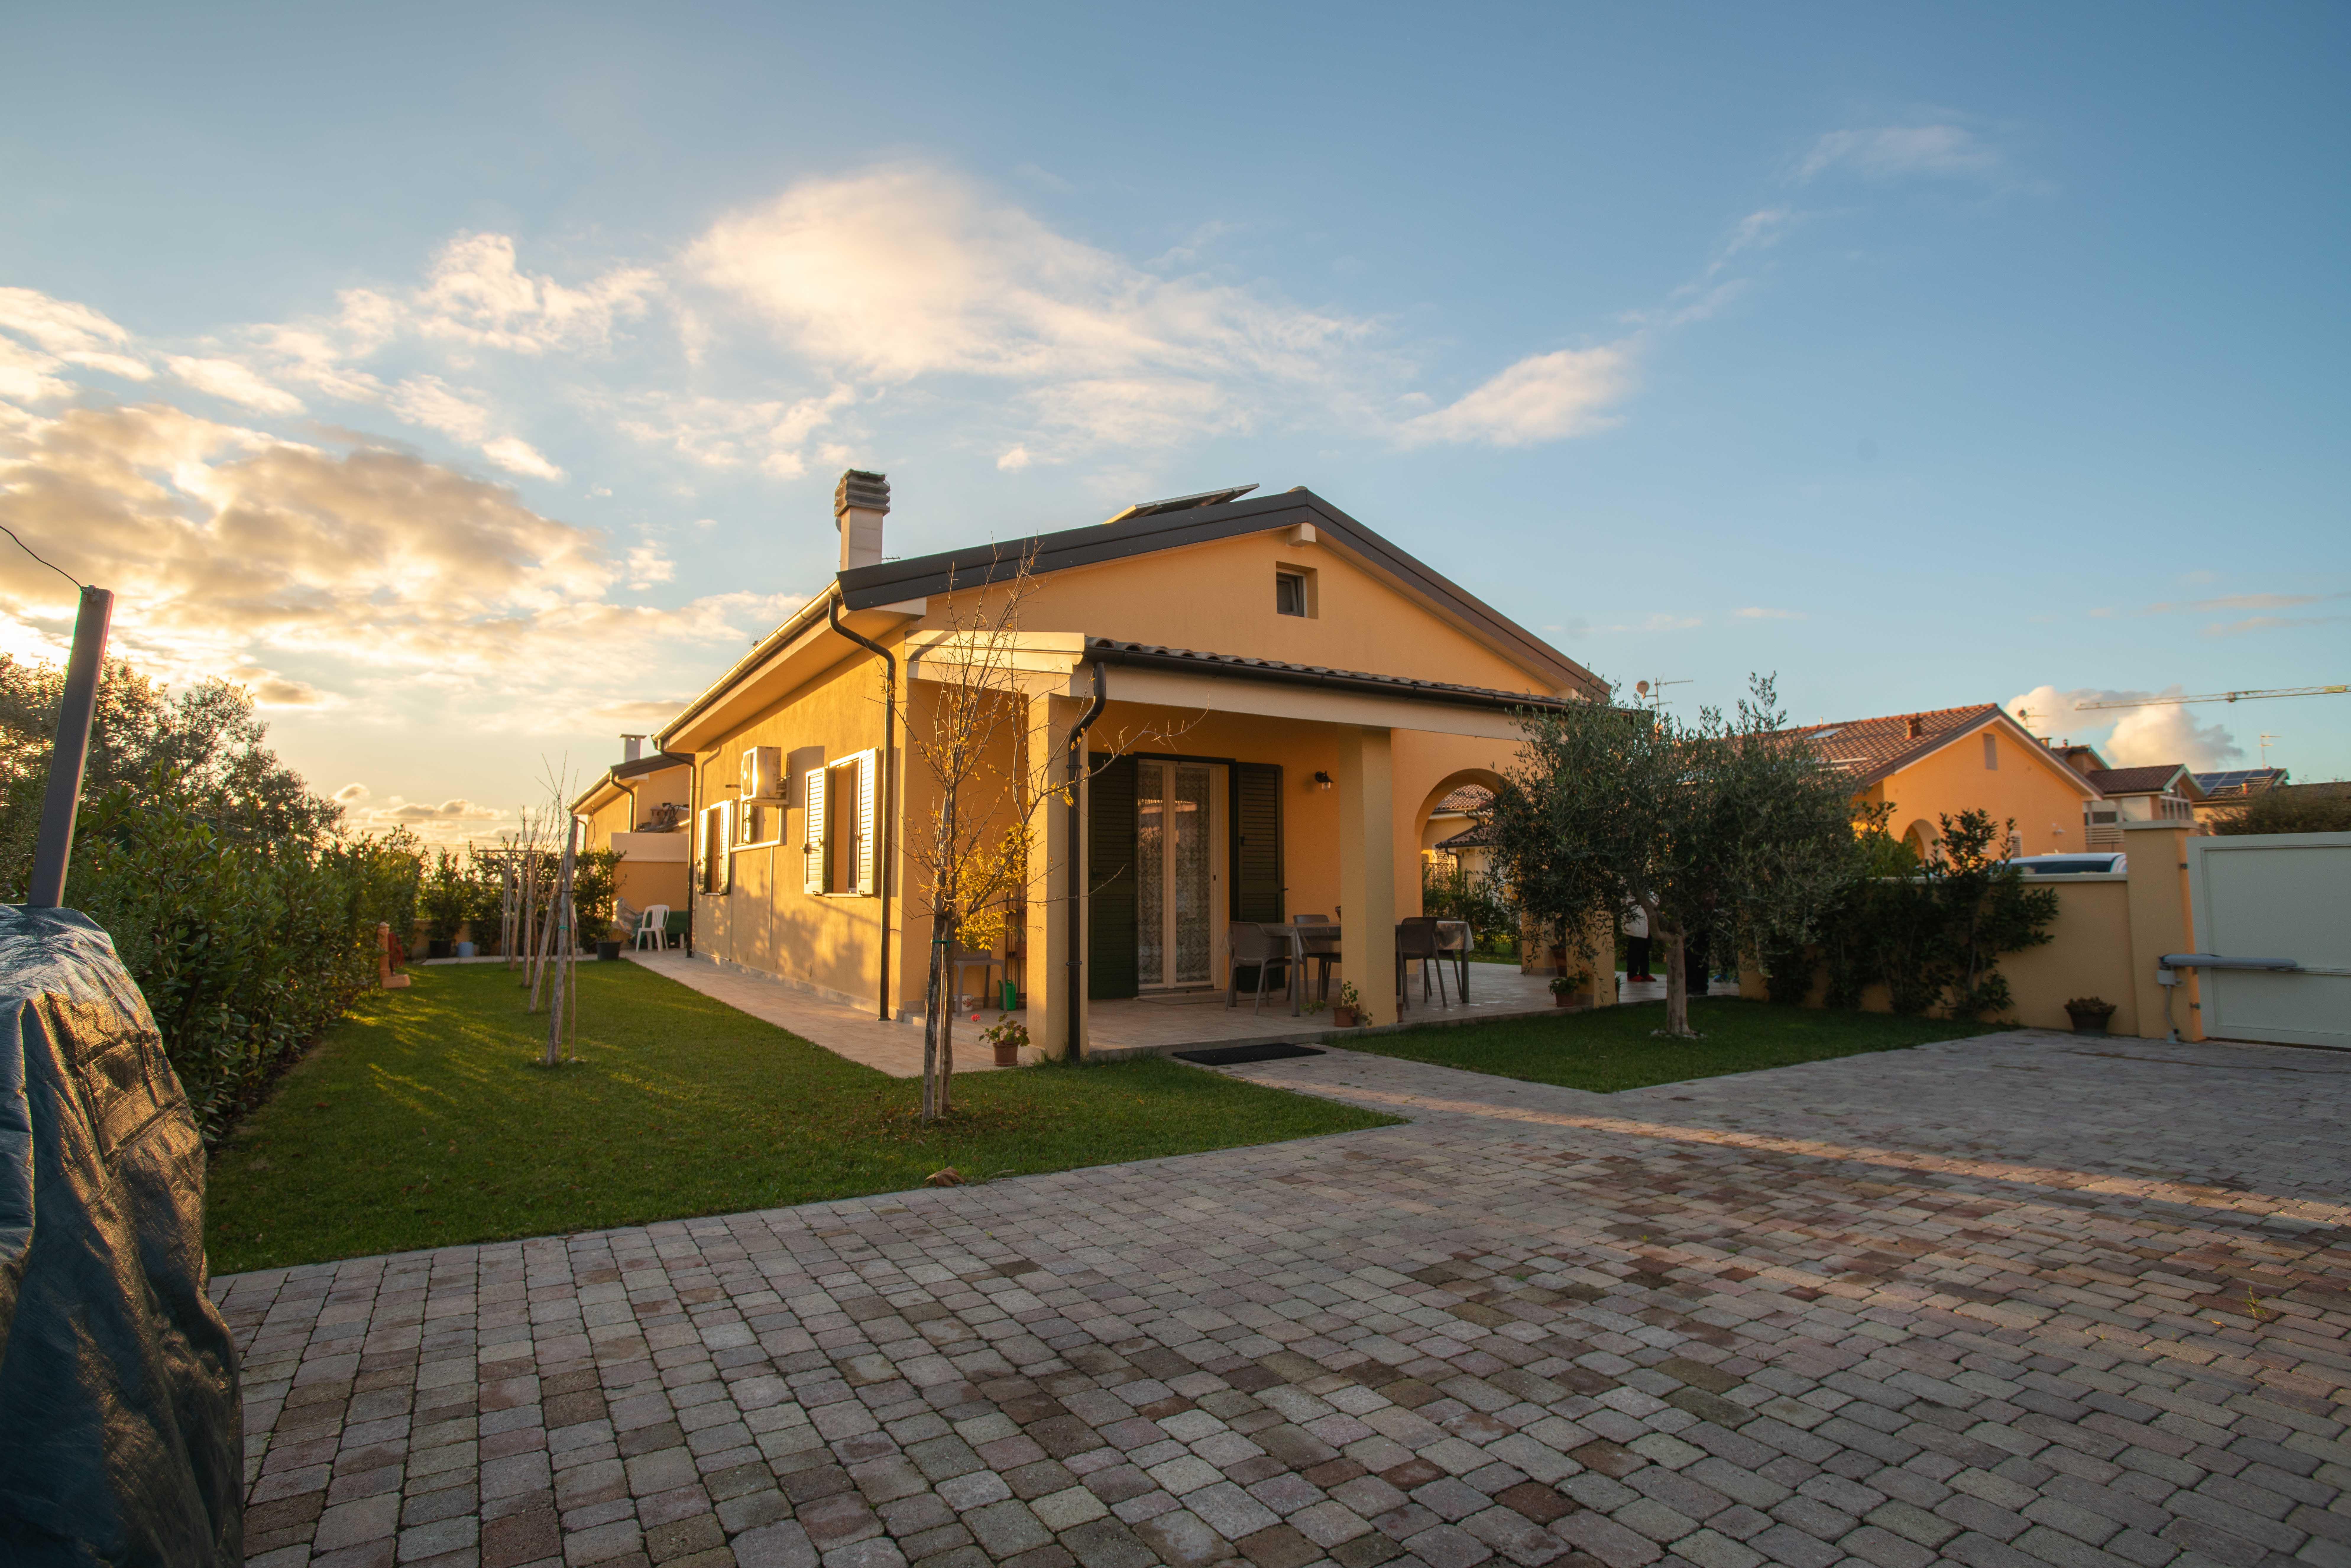 Villetta nuova con giardino